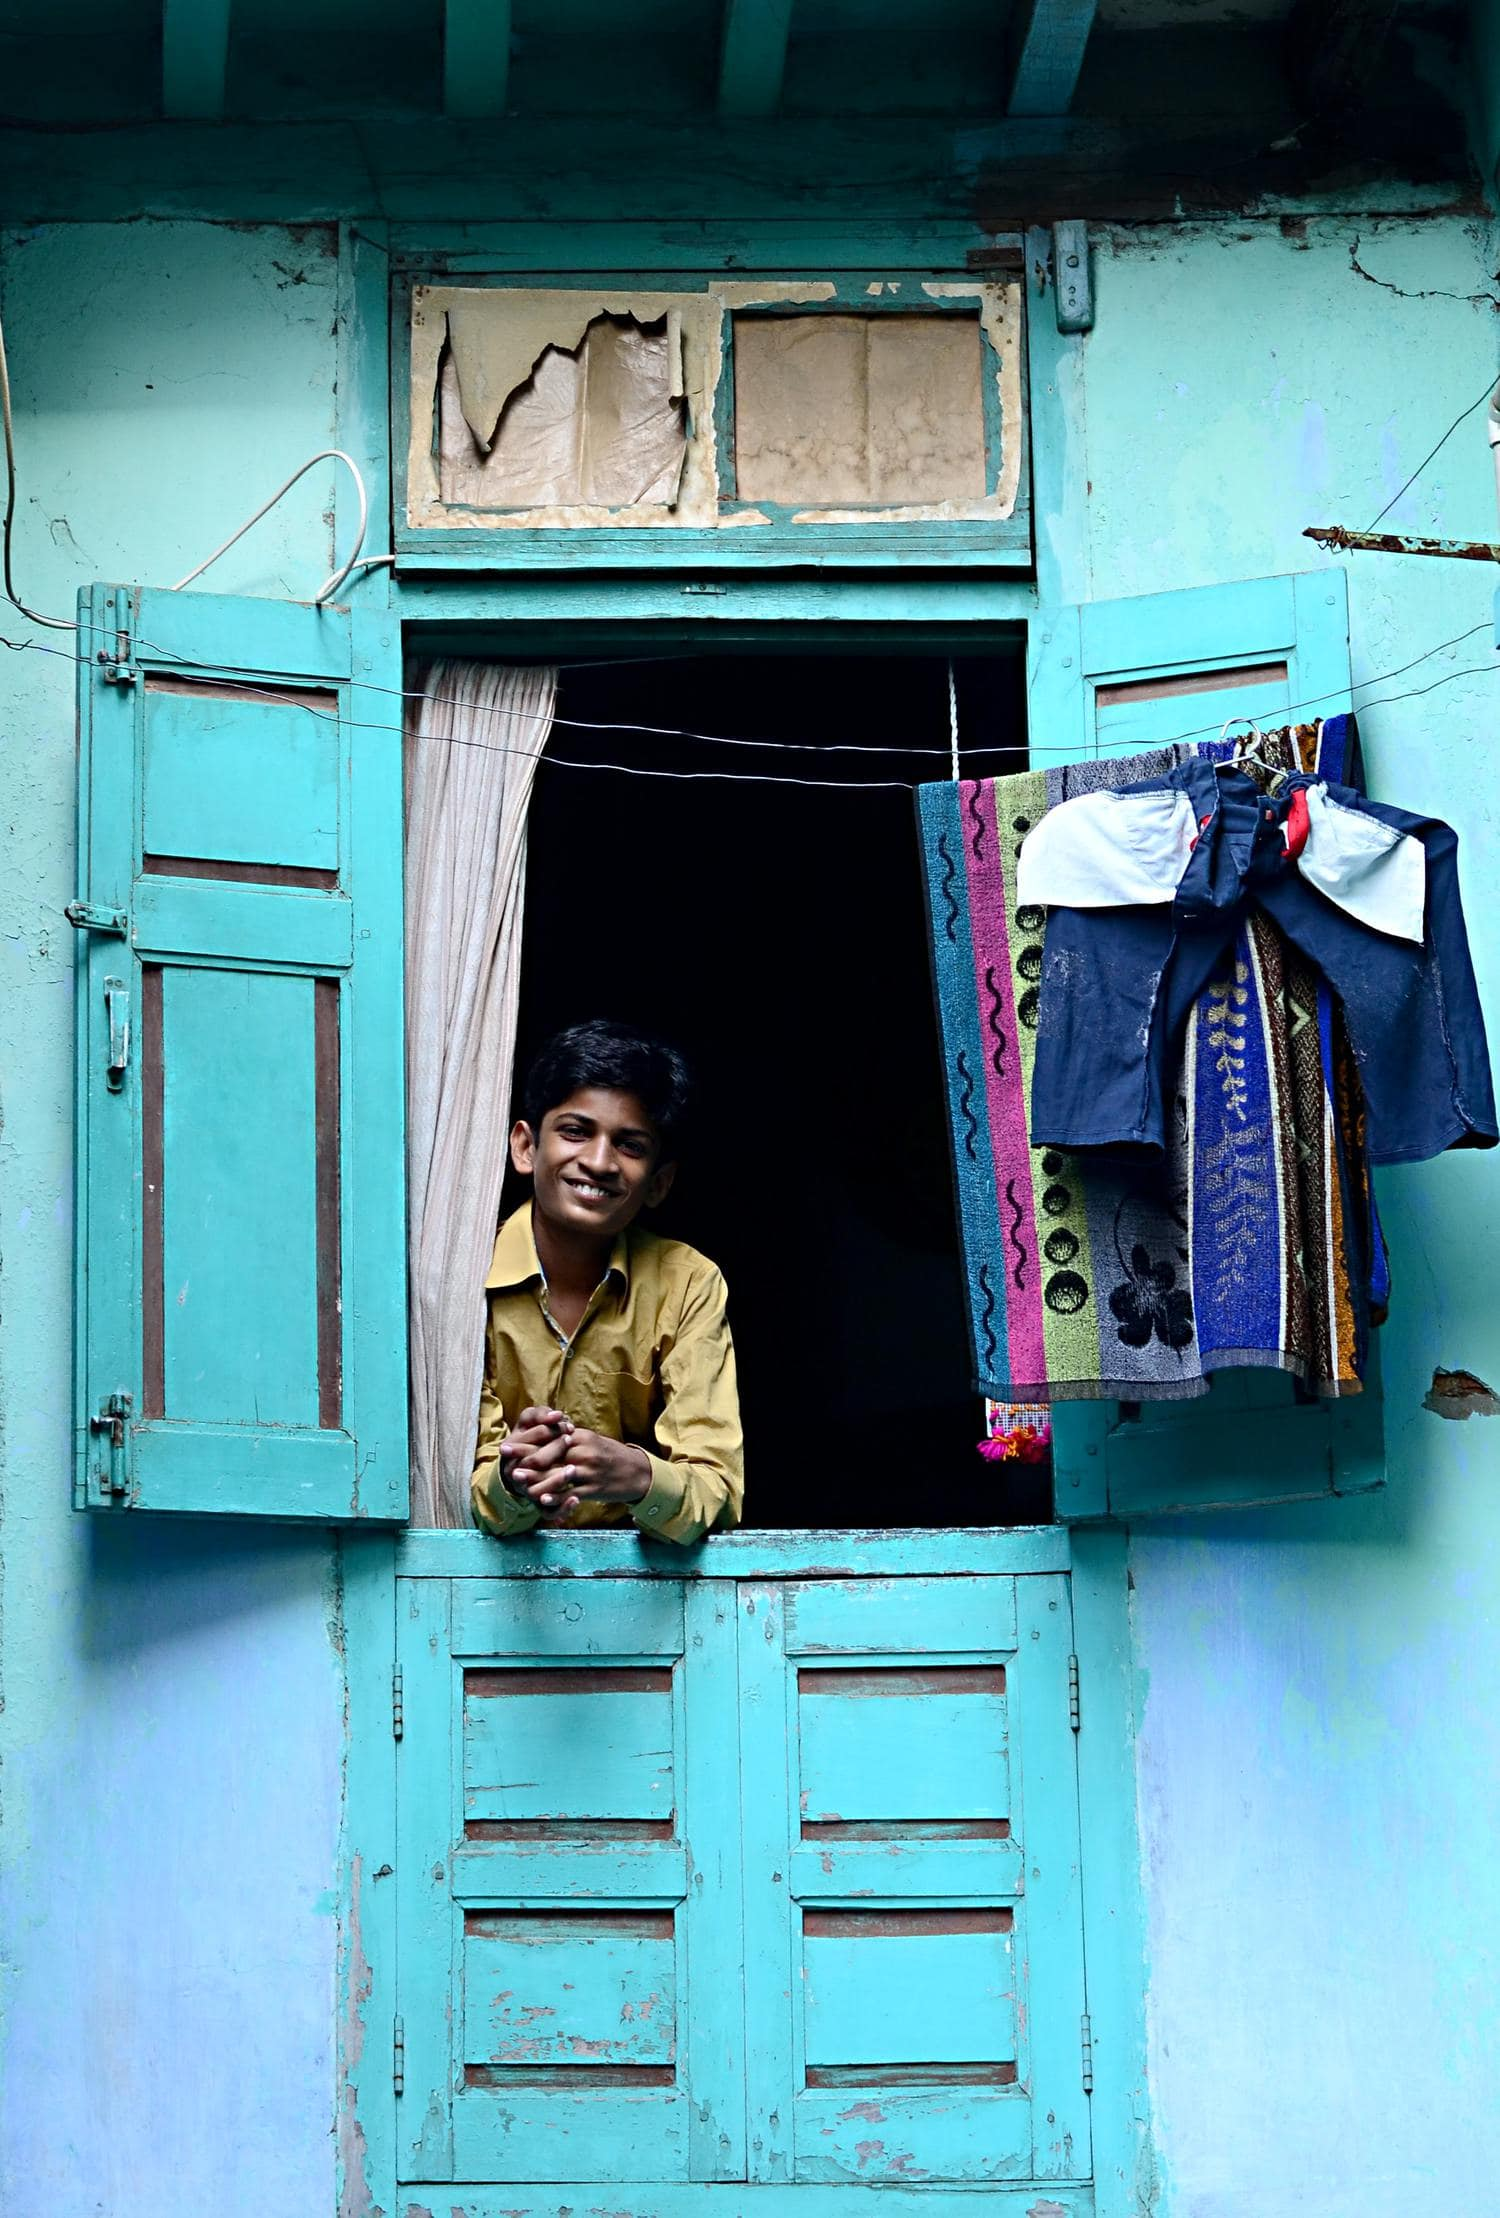 Fotografía de viaje, niño asomado a ventana